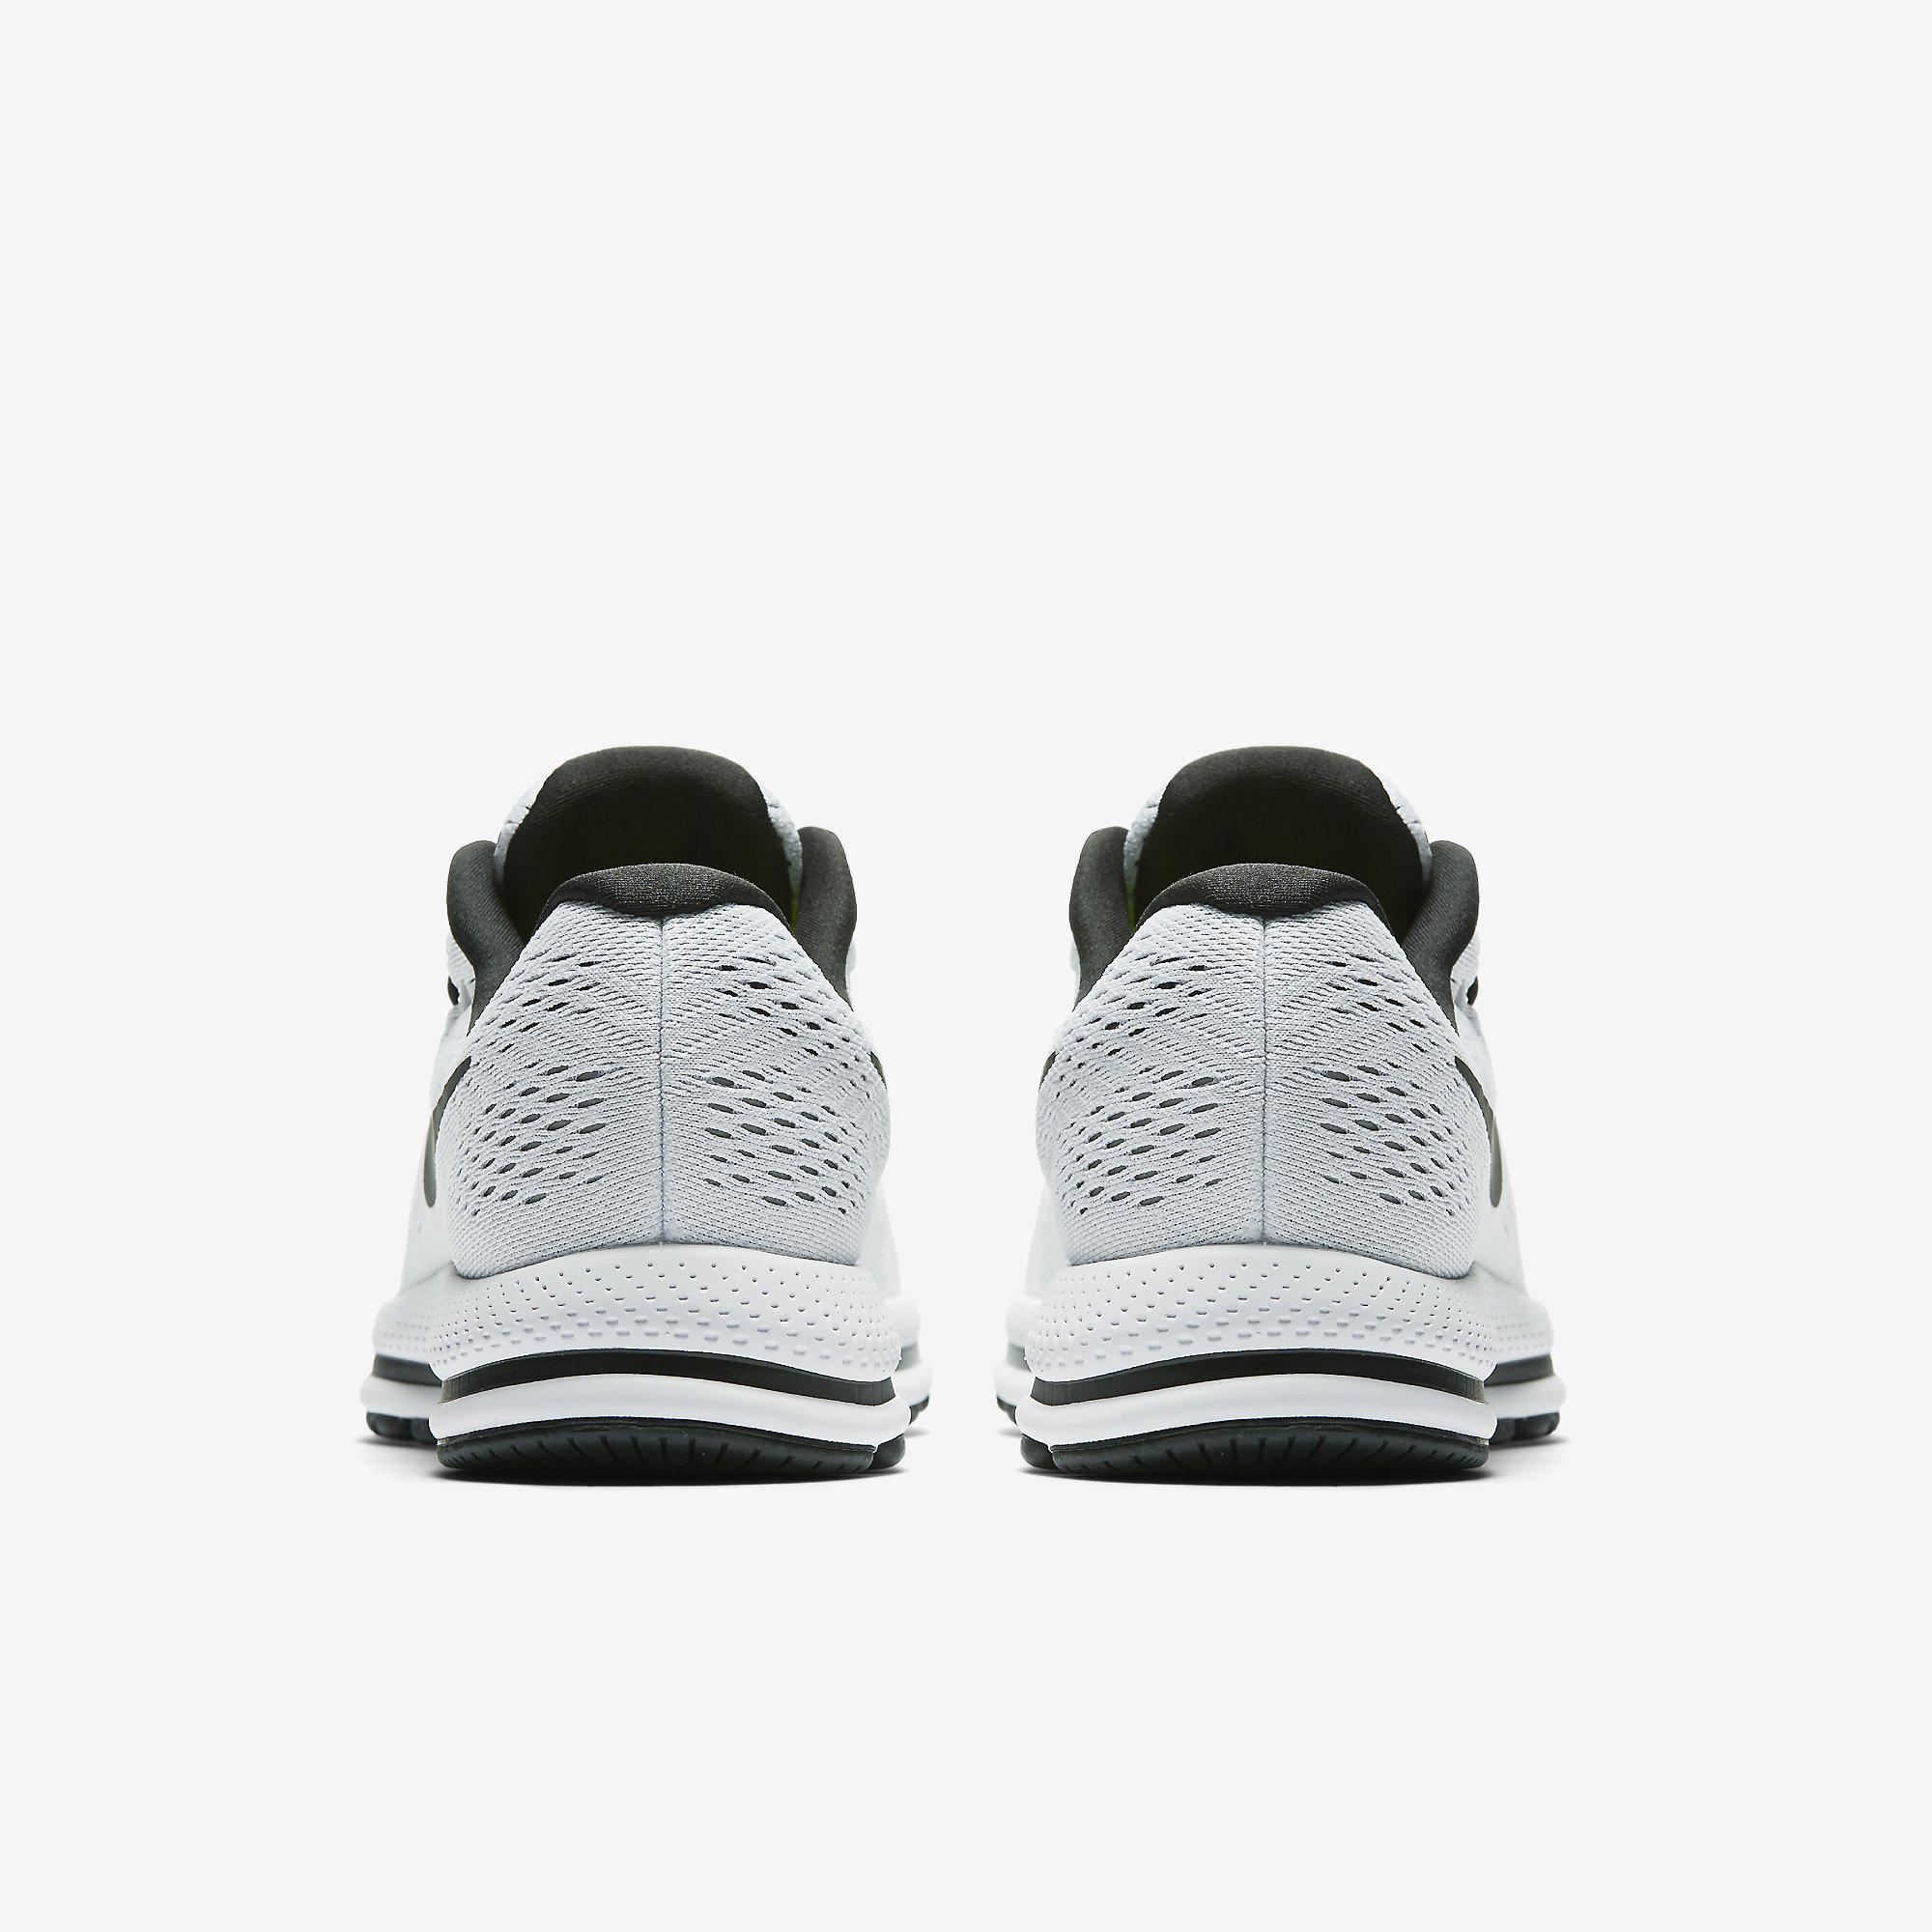 2b60abeaf137d Nike Mens Air Zoom Vomero 12 Running Shoes - White Black ...